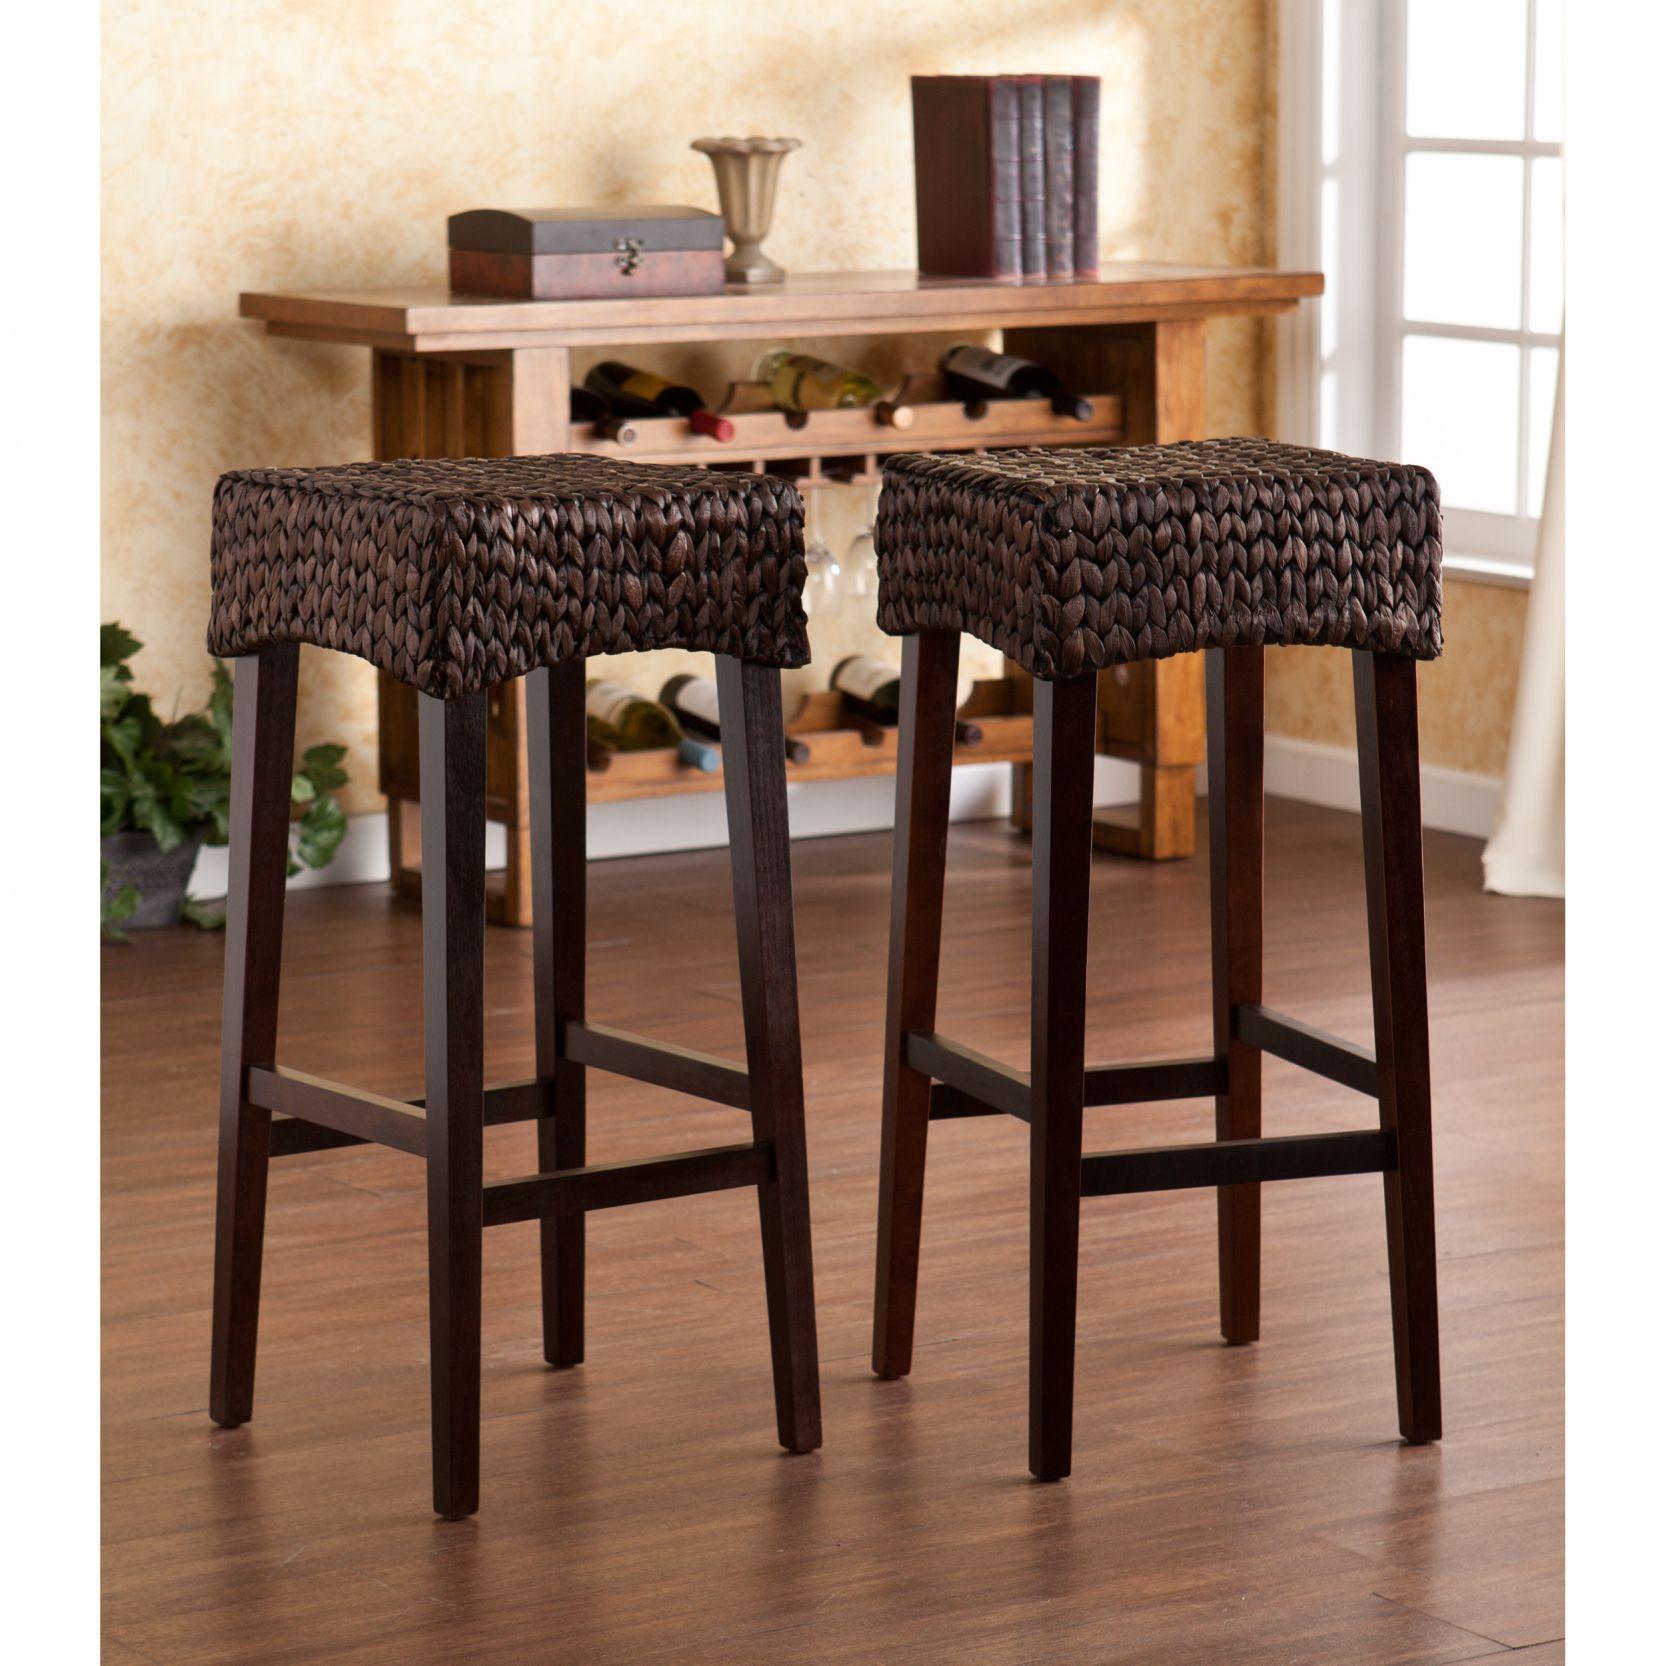 bar height black bar stools modern luxury furniture check more